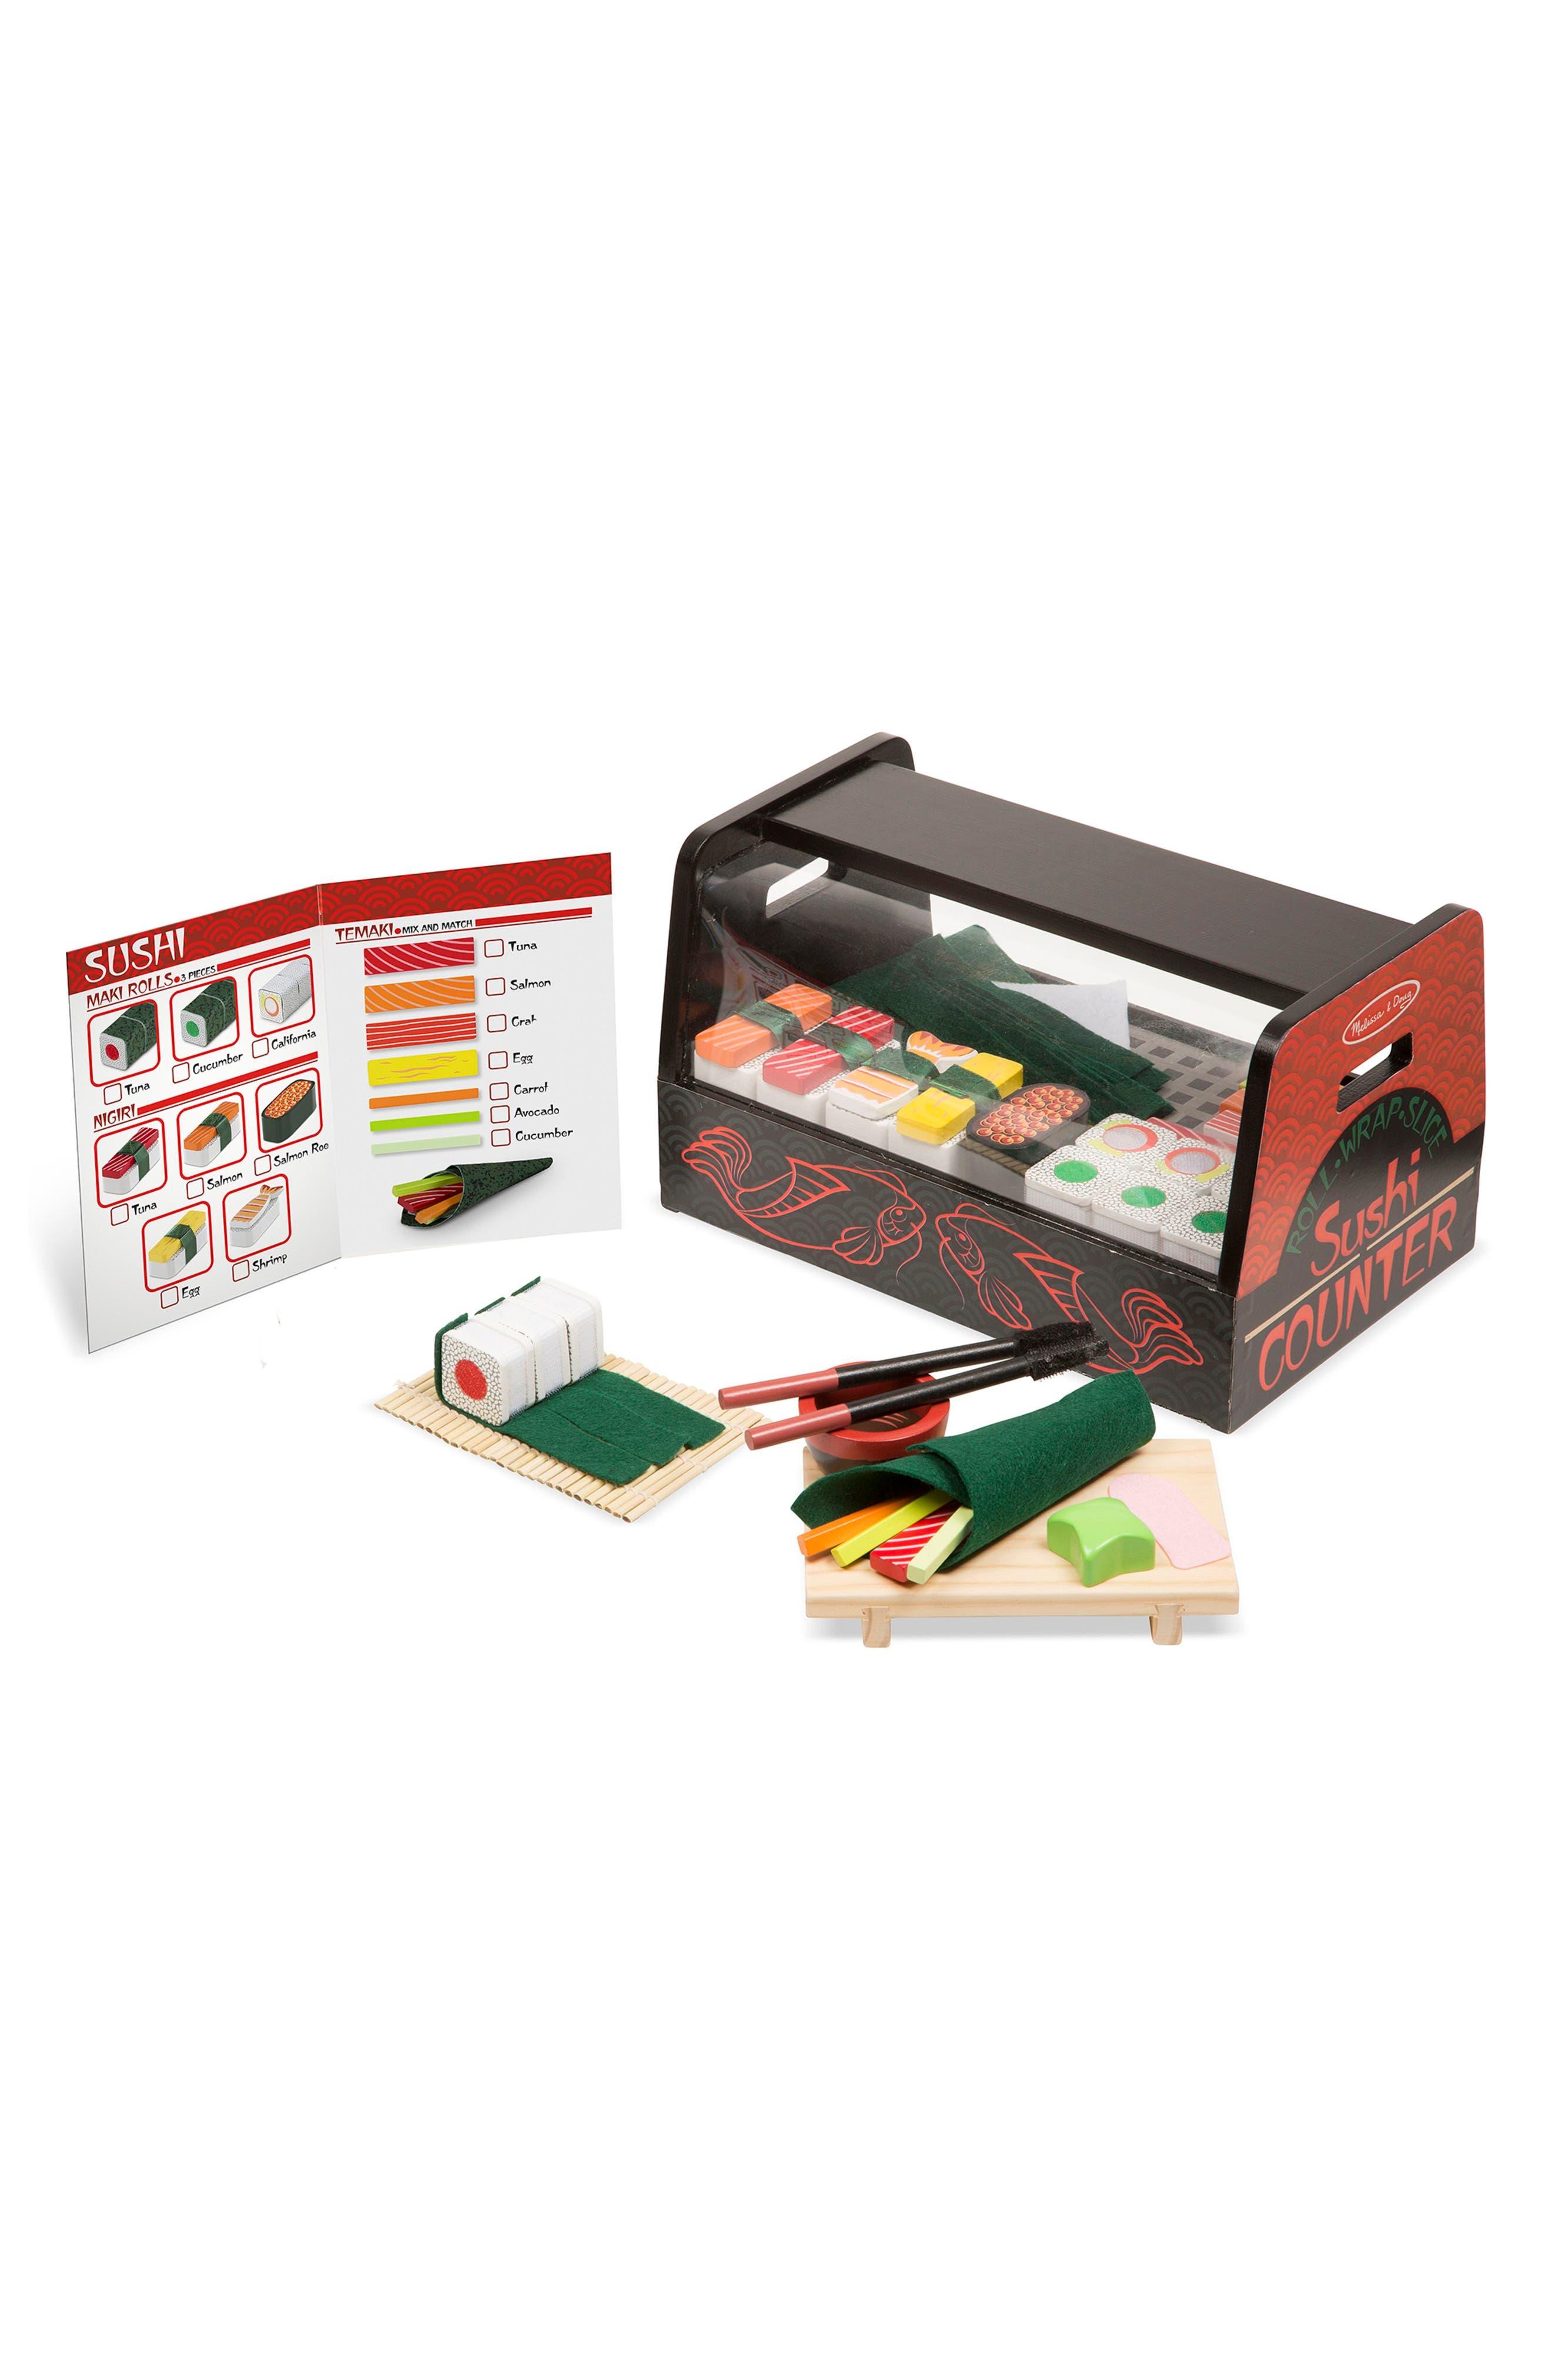 Melissa & Doug 46-Piece Roll Wrap Slice Sushi Making Play Set